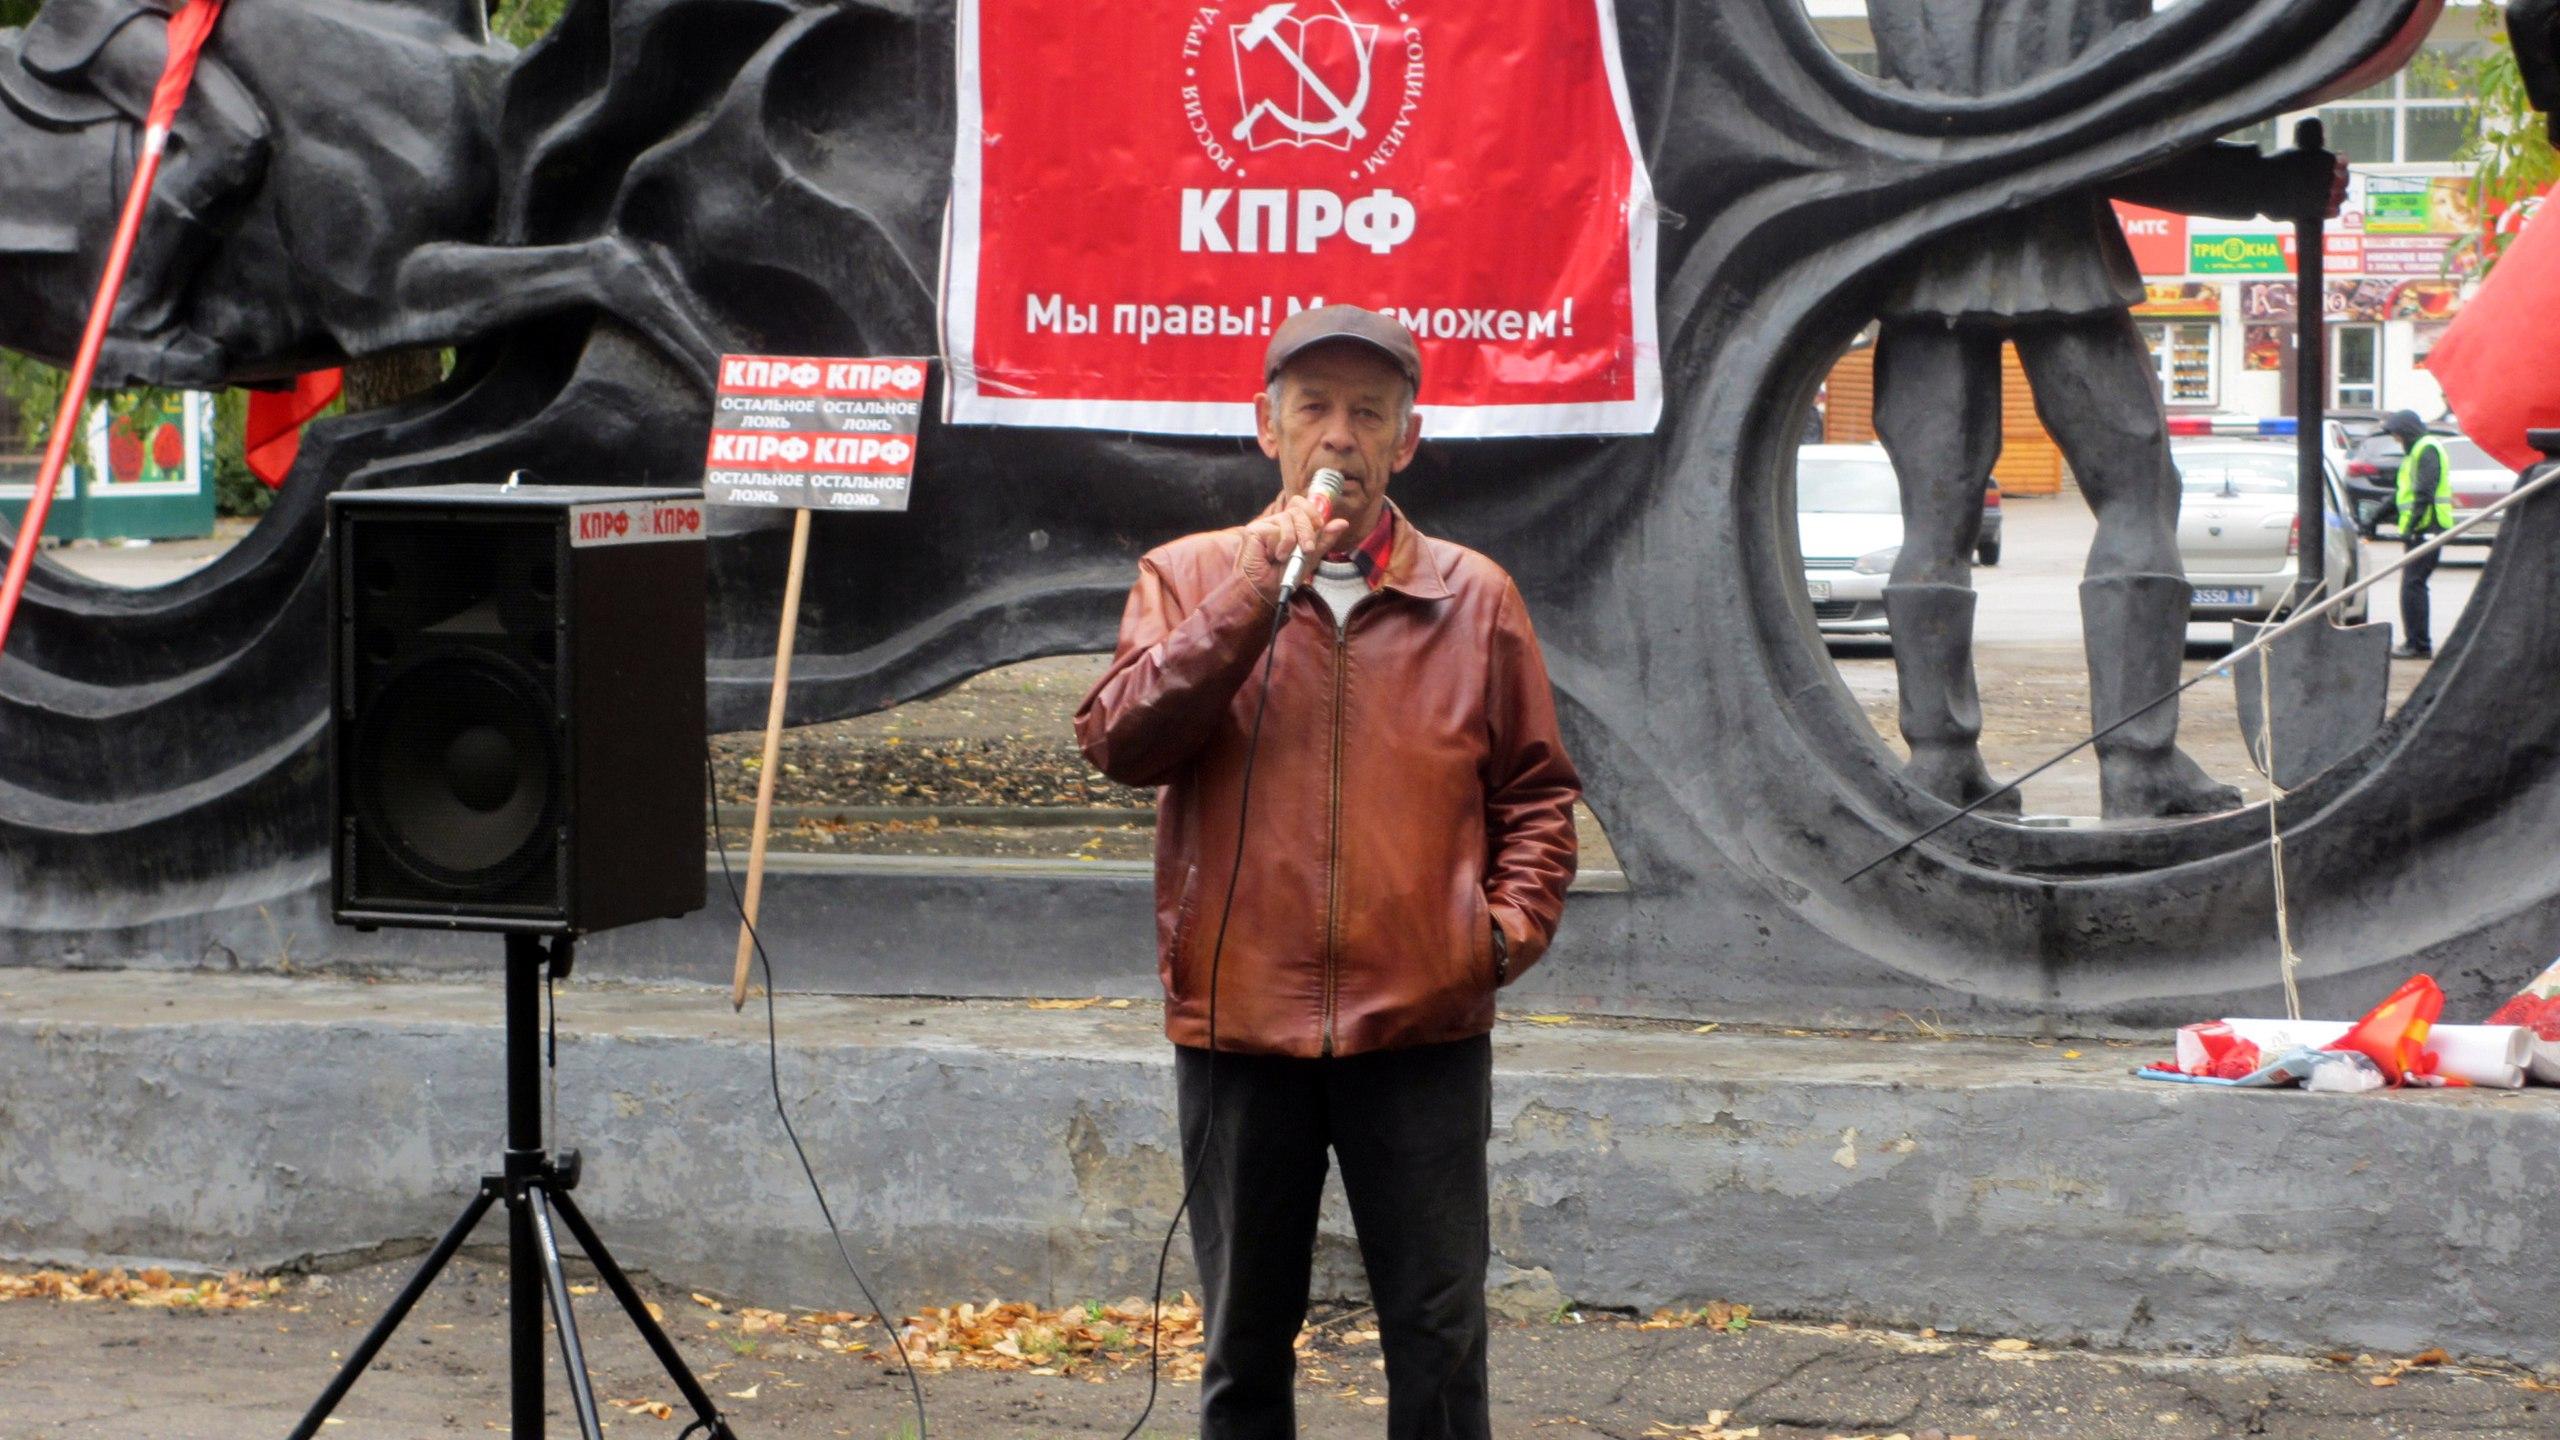 Митинг в Сызрани 01.10.17